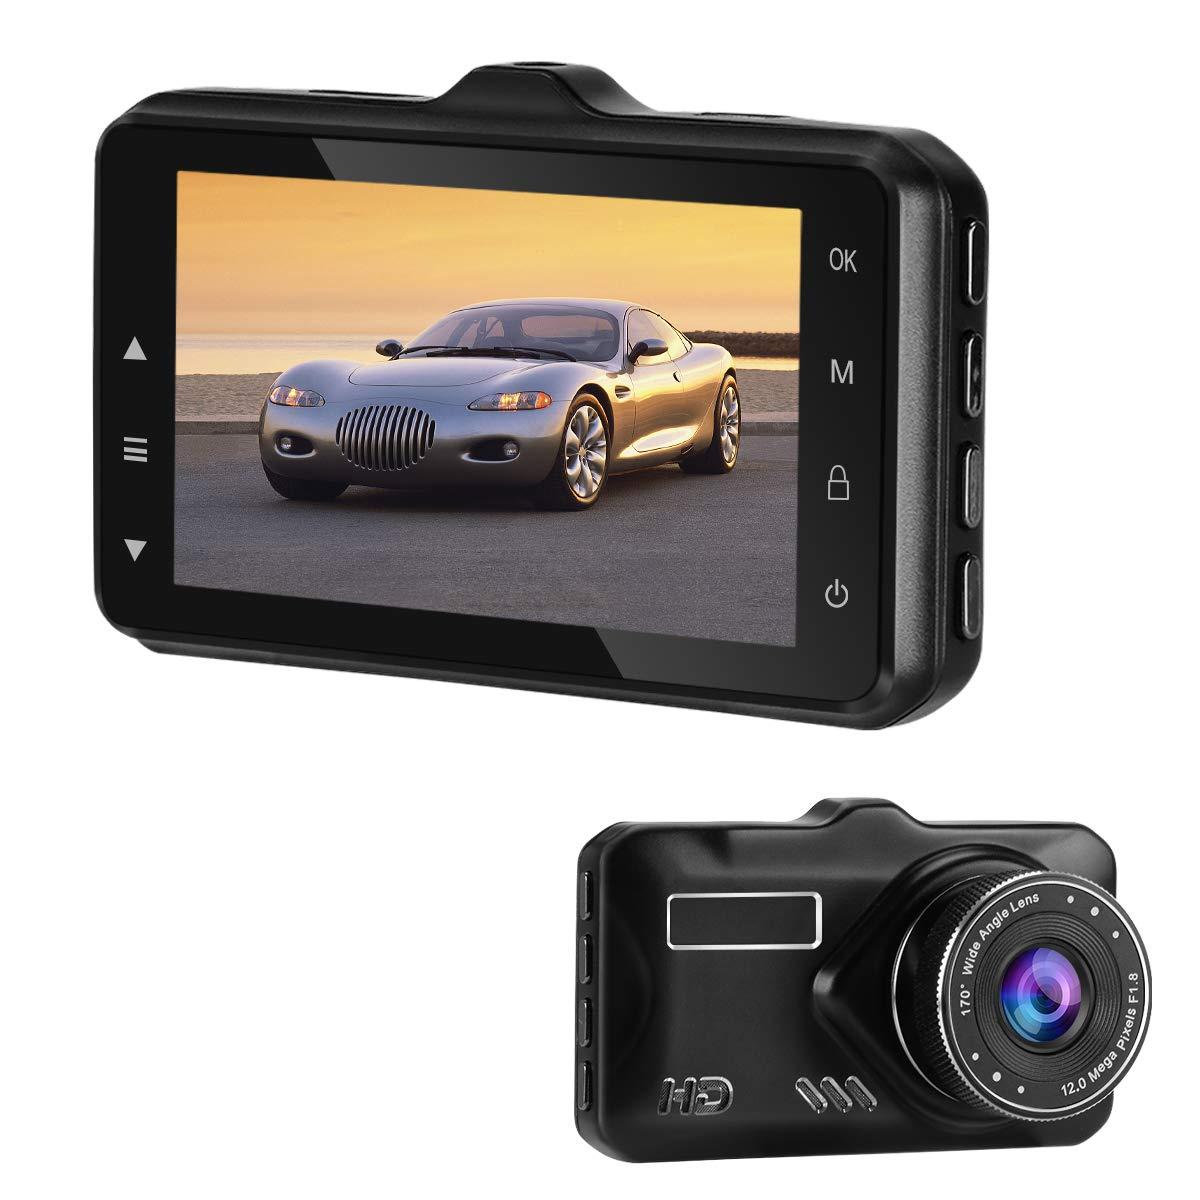 Dash Cam, Car Camera 1080P FHD Car DVR Driving Recorder 3'' LCD Screen 170°Wide Angle, G-Sensor, WDR, Parking Monitor, Loop Recording, Motion Detection (Black)